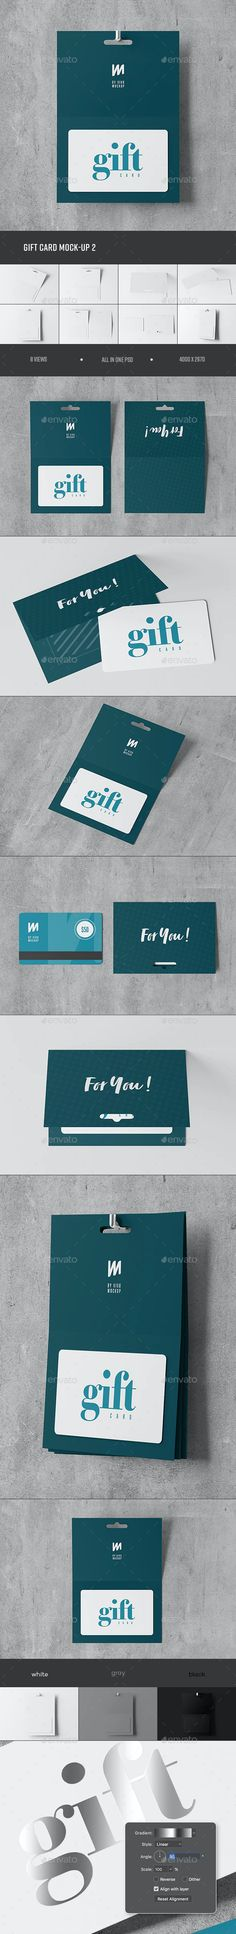 Gift Card Mock-up 2 by VivoMockups | GraphicRiver